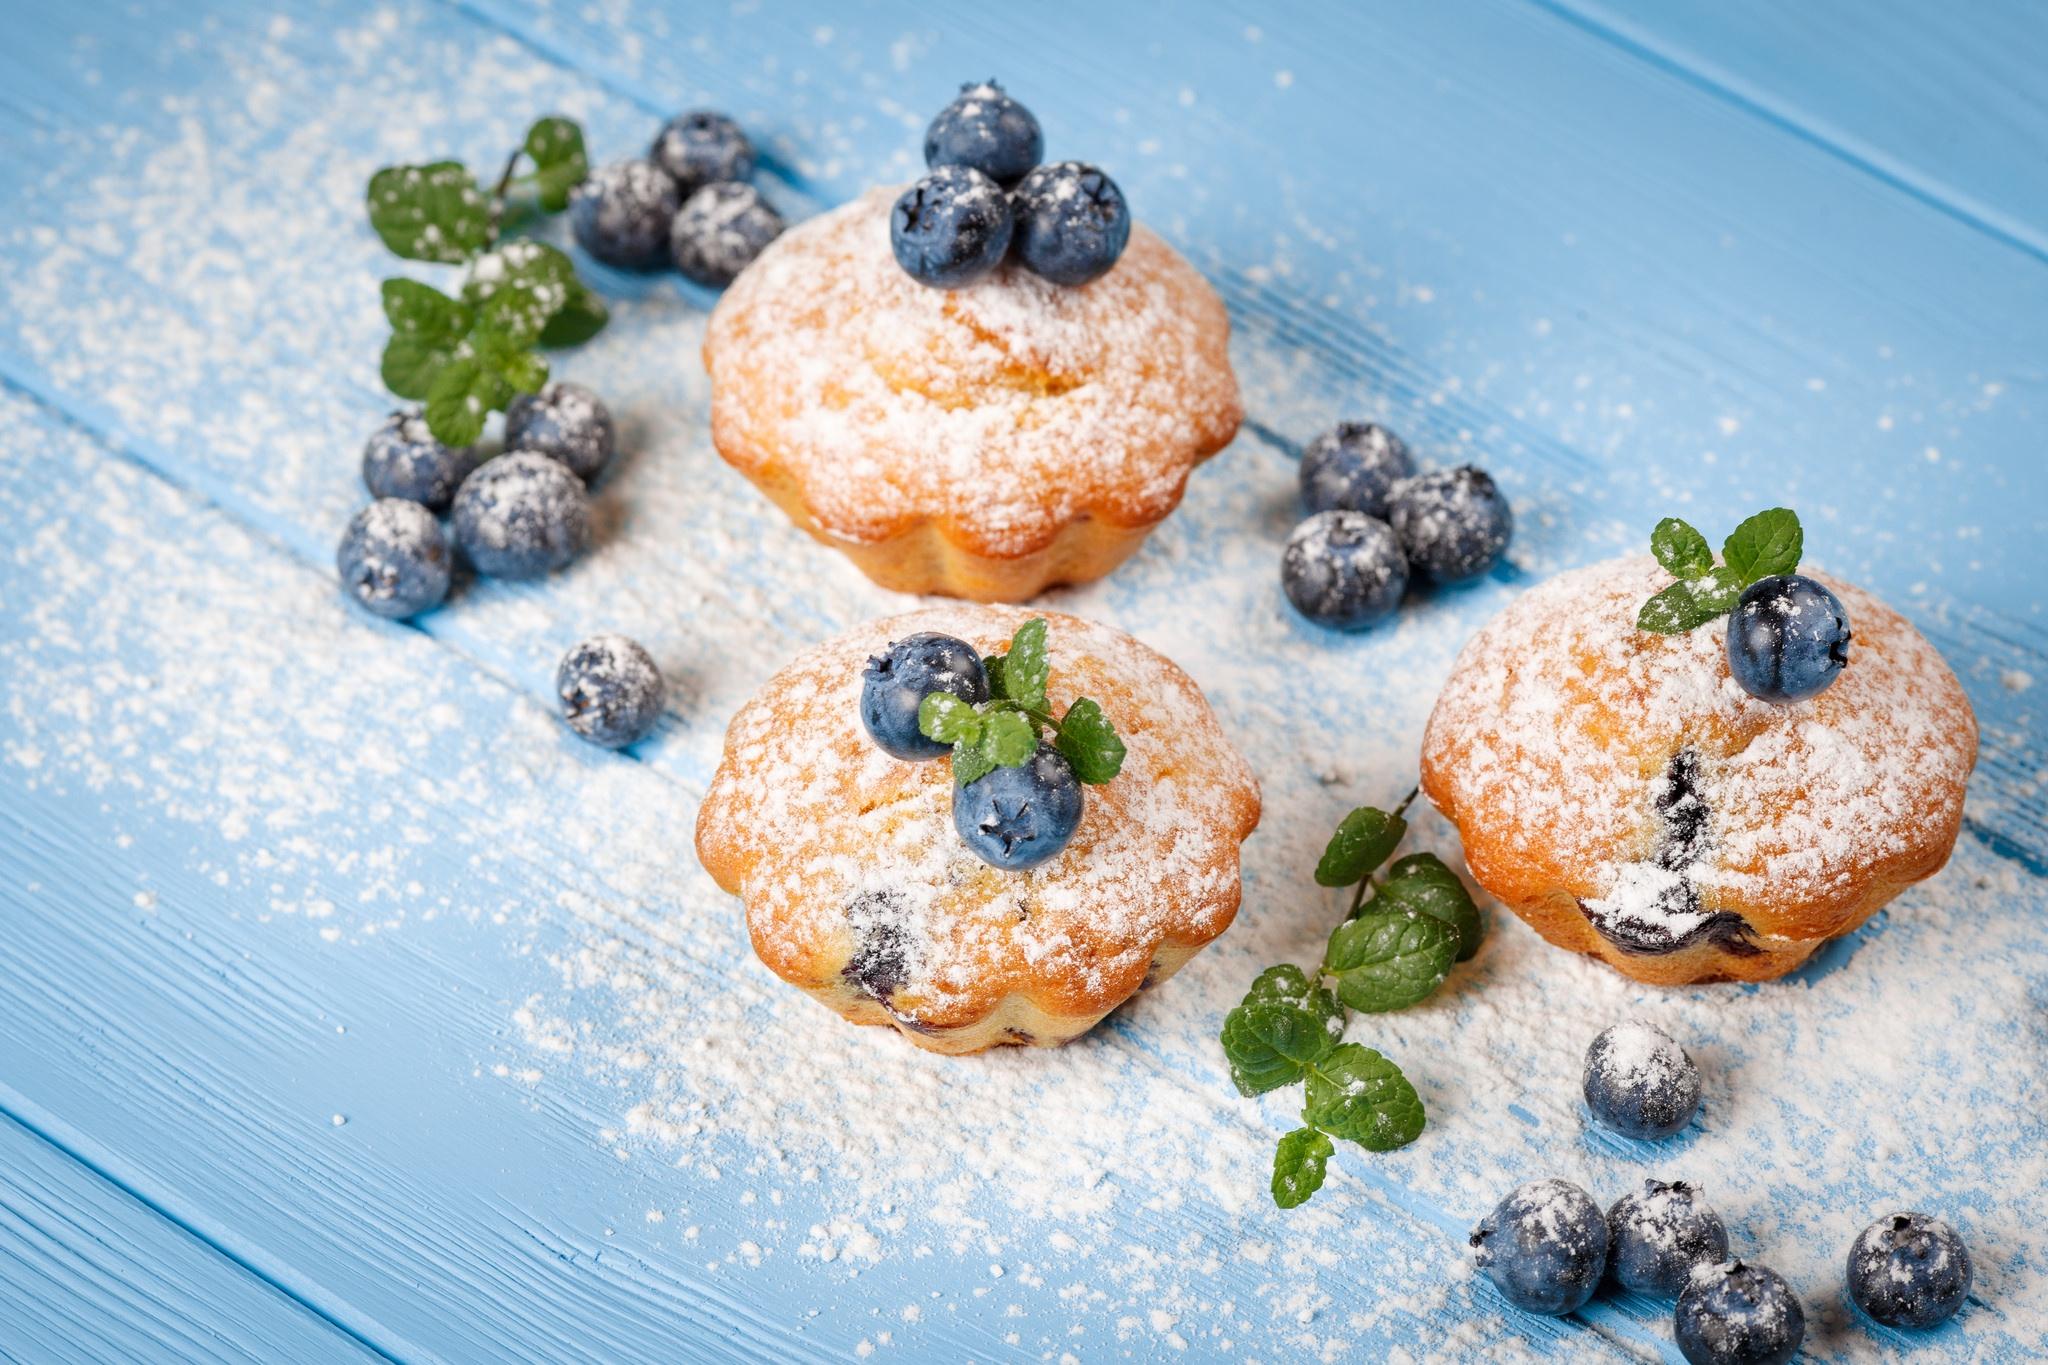 Blueberry Madeleine Pastry Still Life 2048x1365